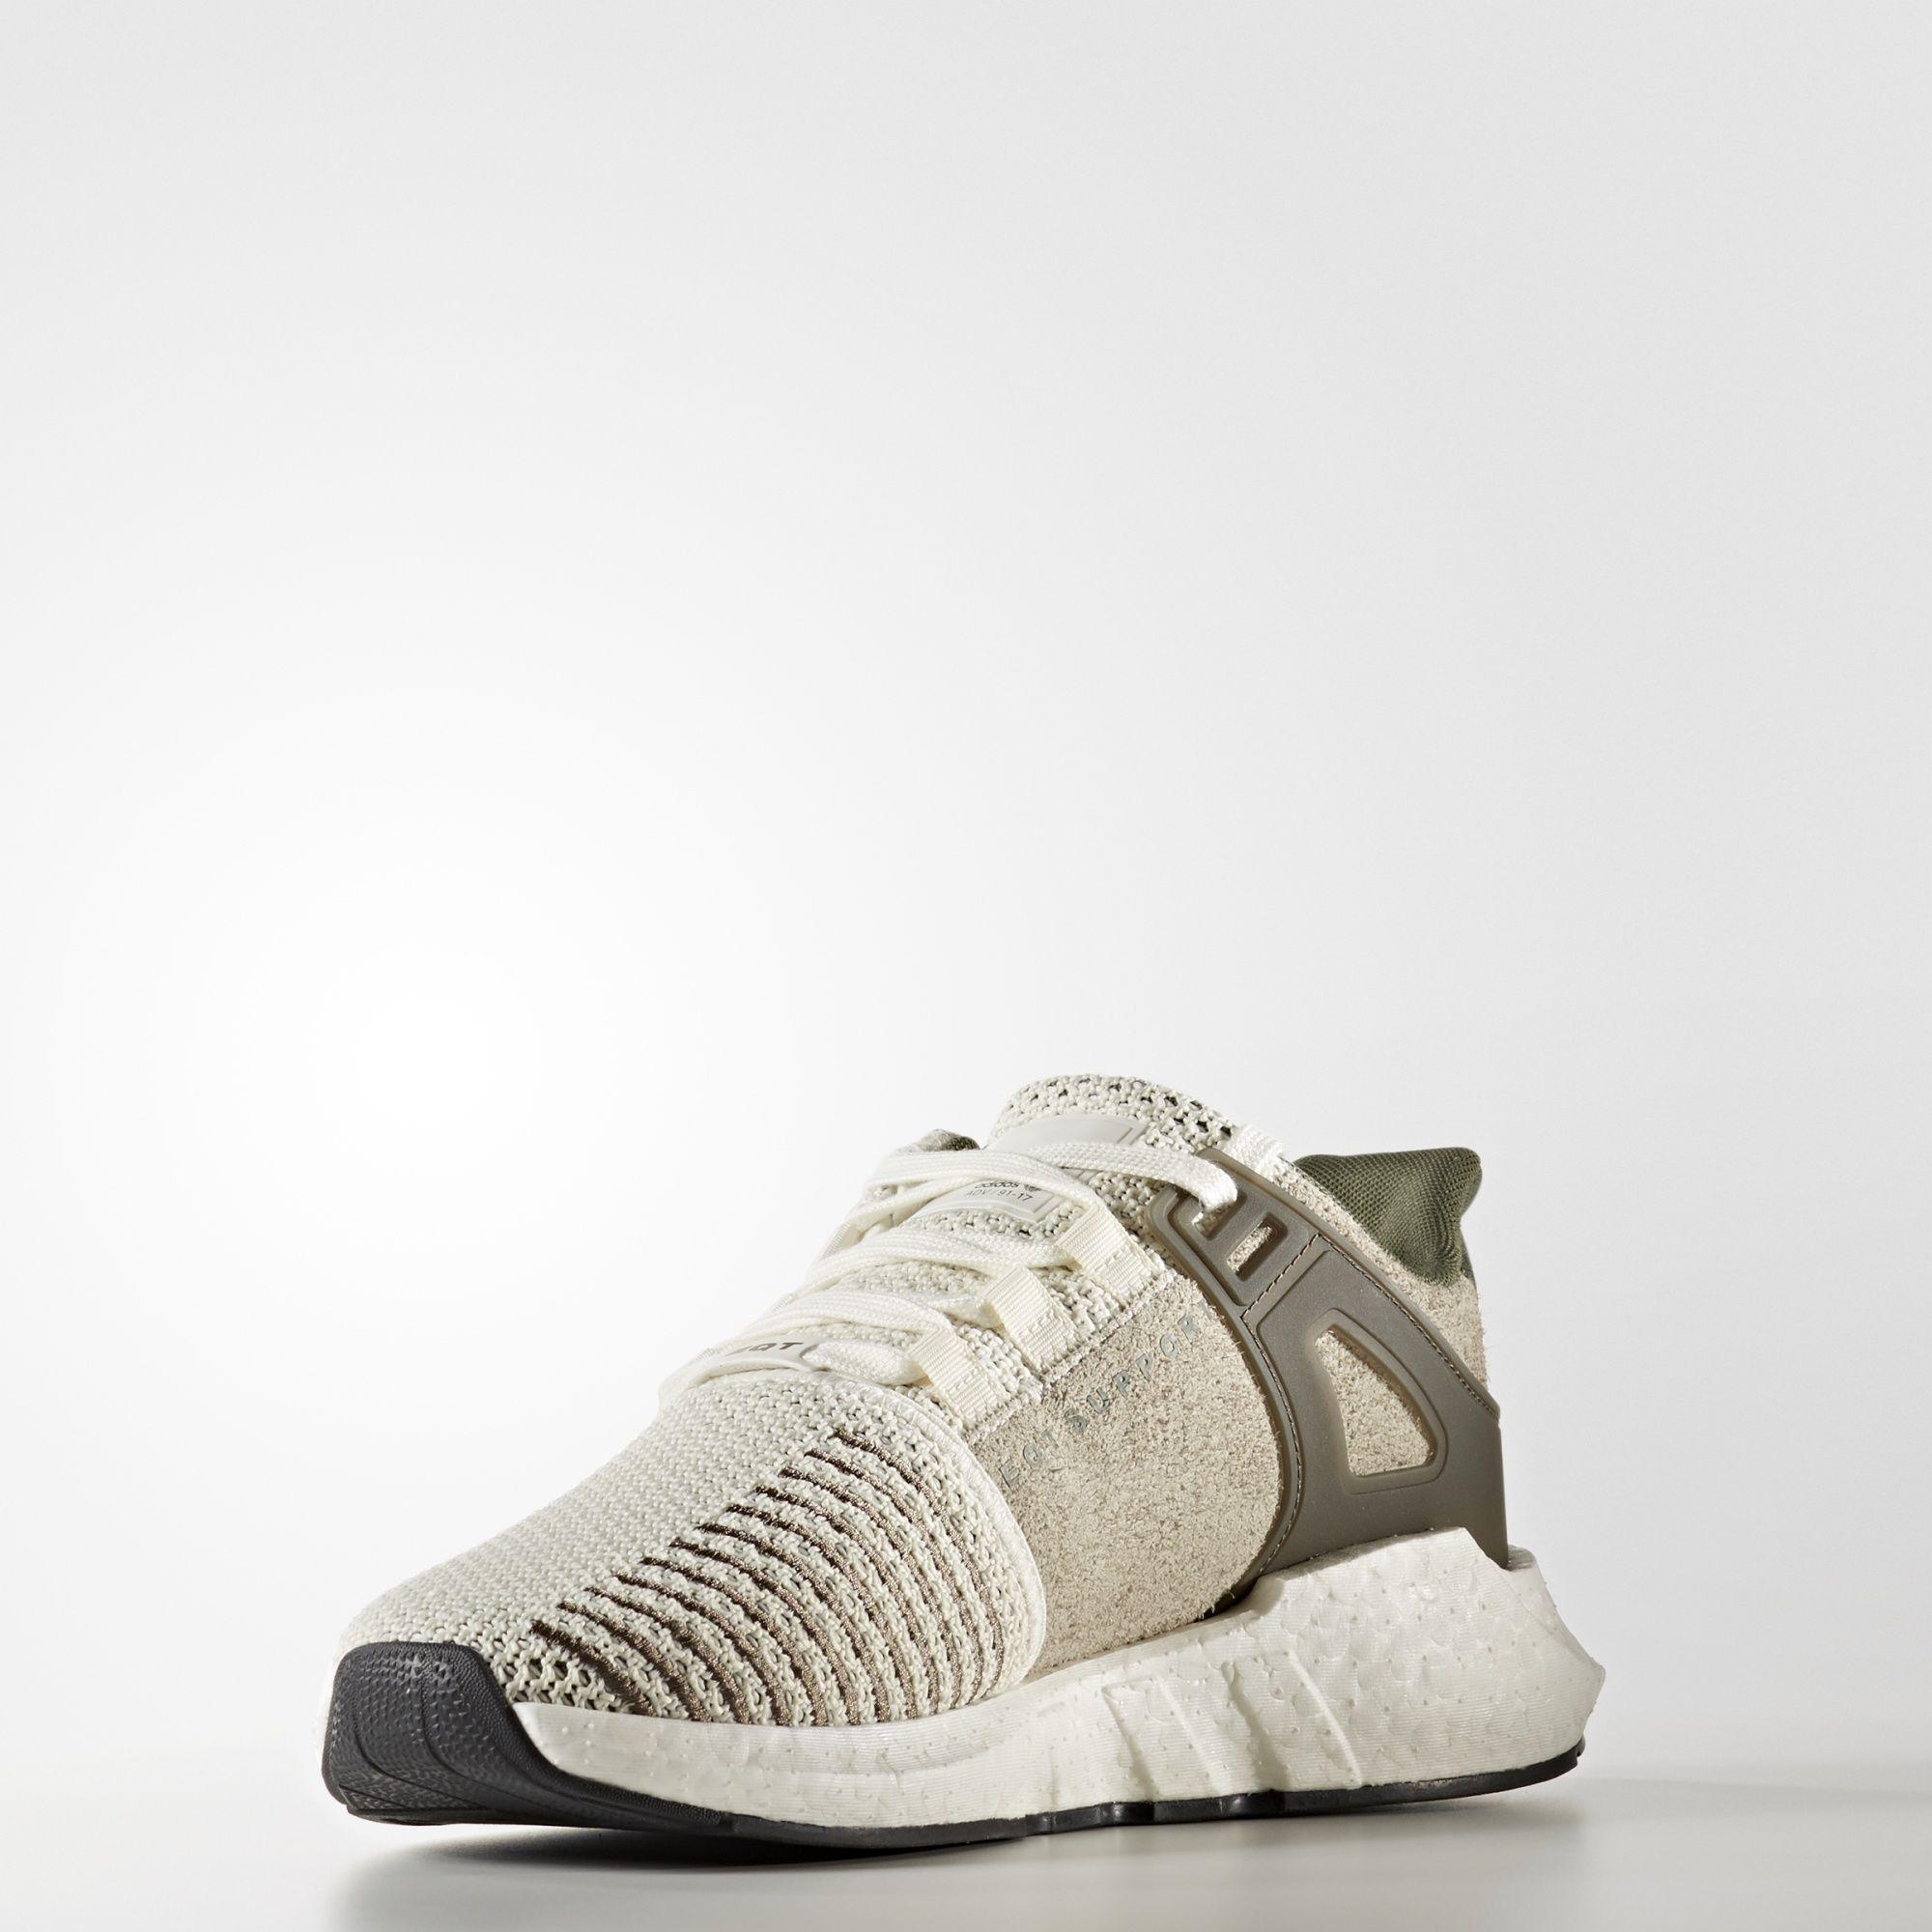 adidas EQT Support 93/17 Shoes - Mens Shoes